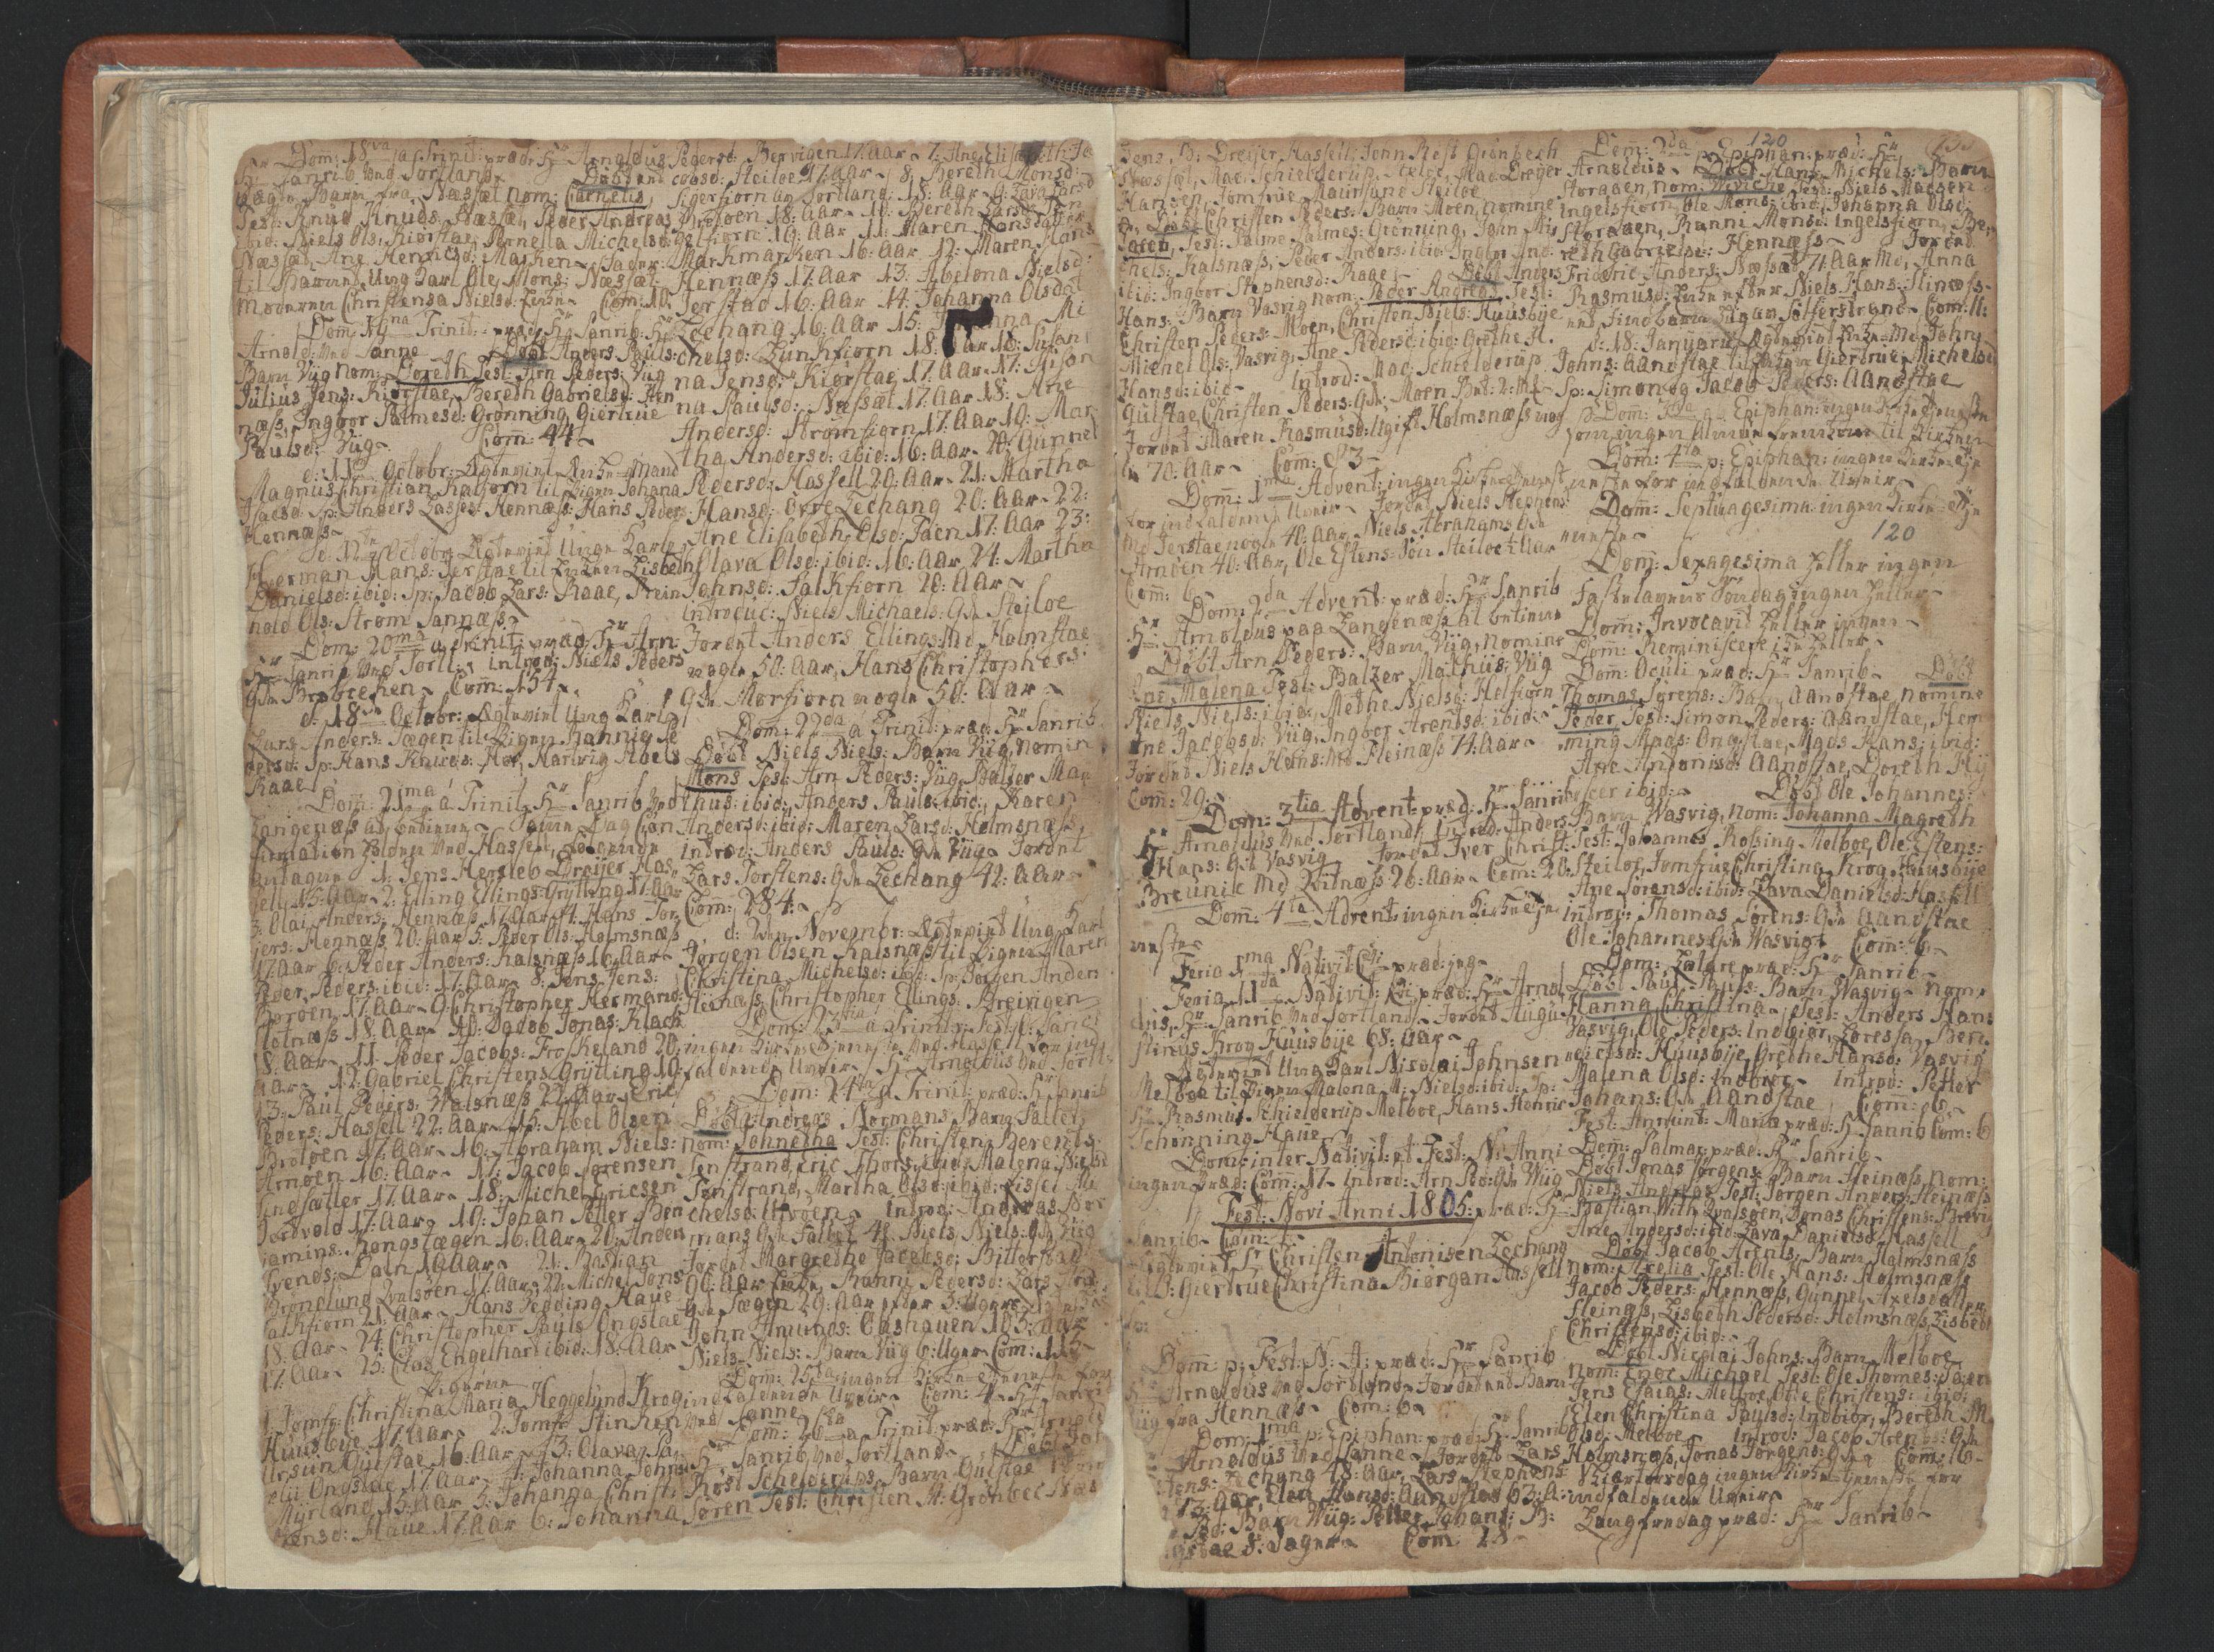 SAT, Ministerialprotokoller, klokkerbøker og fødselsregistre - Nordland, 888/L1233: Ministerialbok nr. 888A02, 1754-1811, s. 133